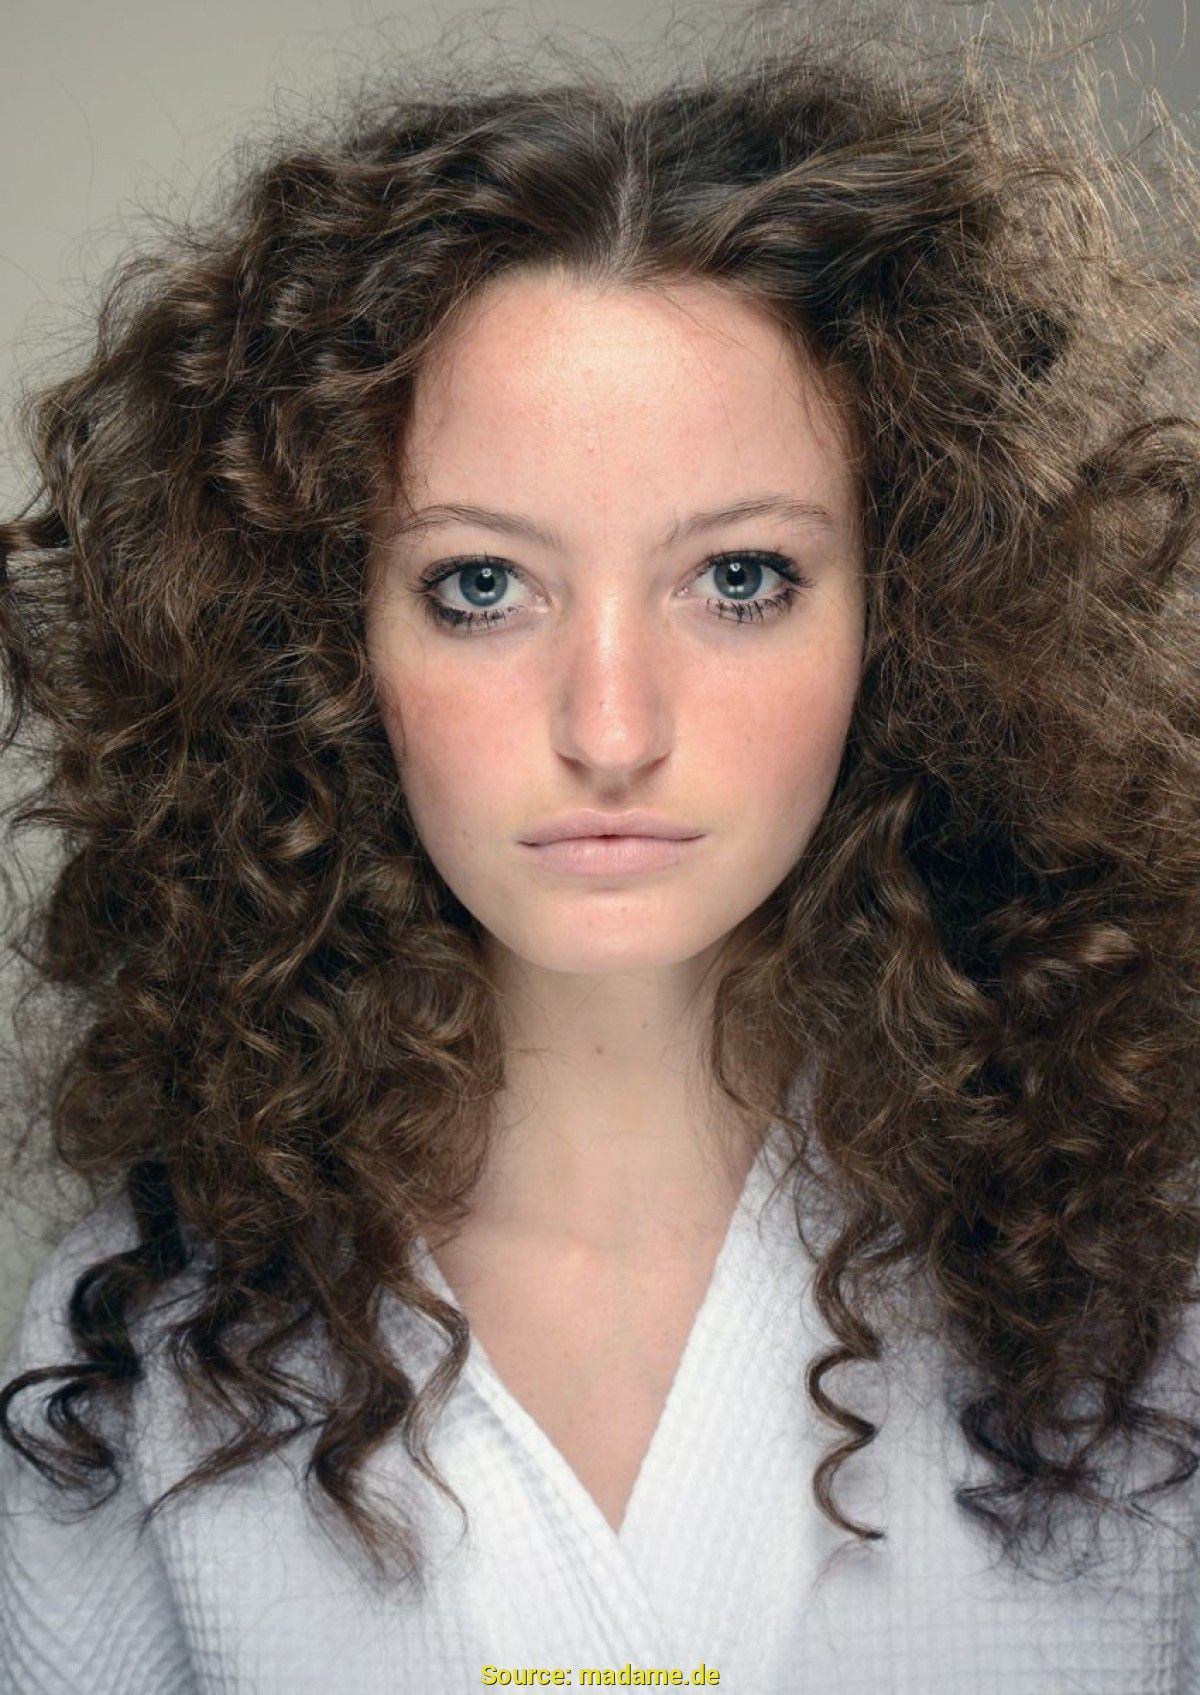 Frisuren Schulterlanges Haar Bilder Hair Style Women Pinterest